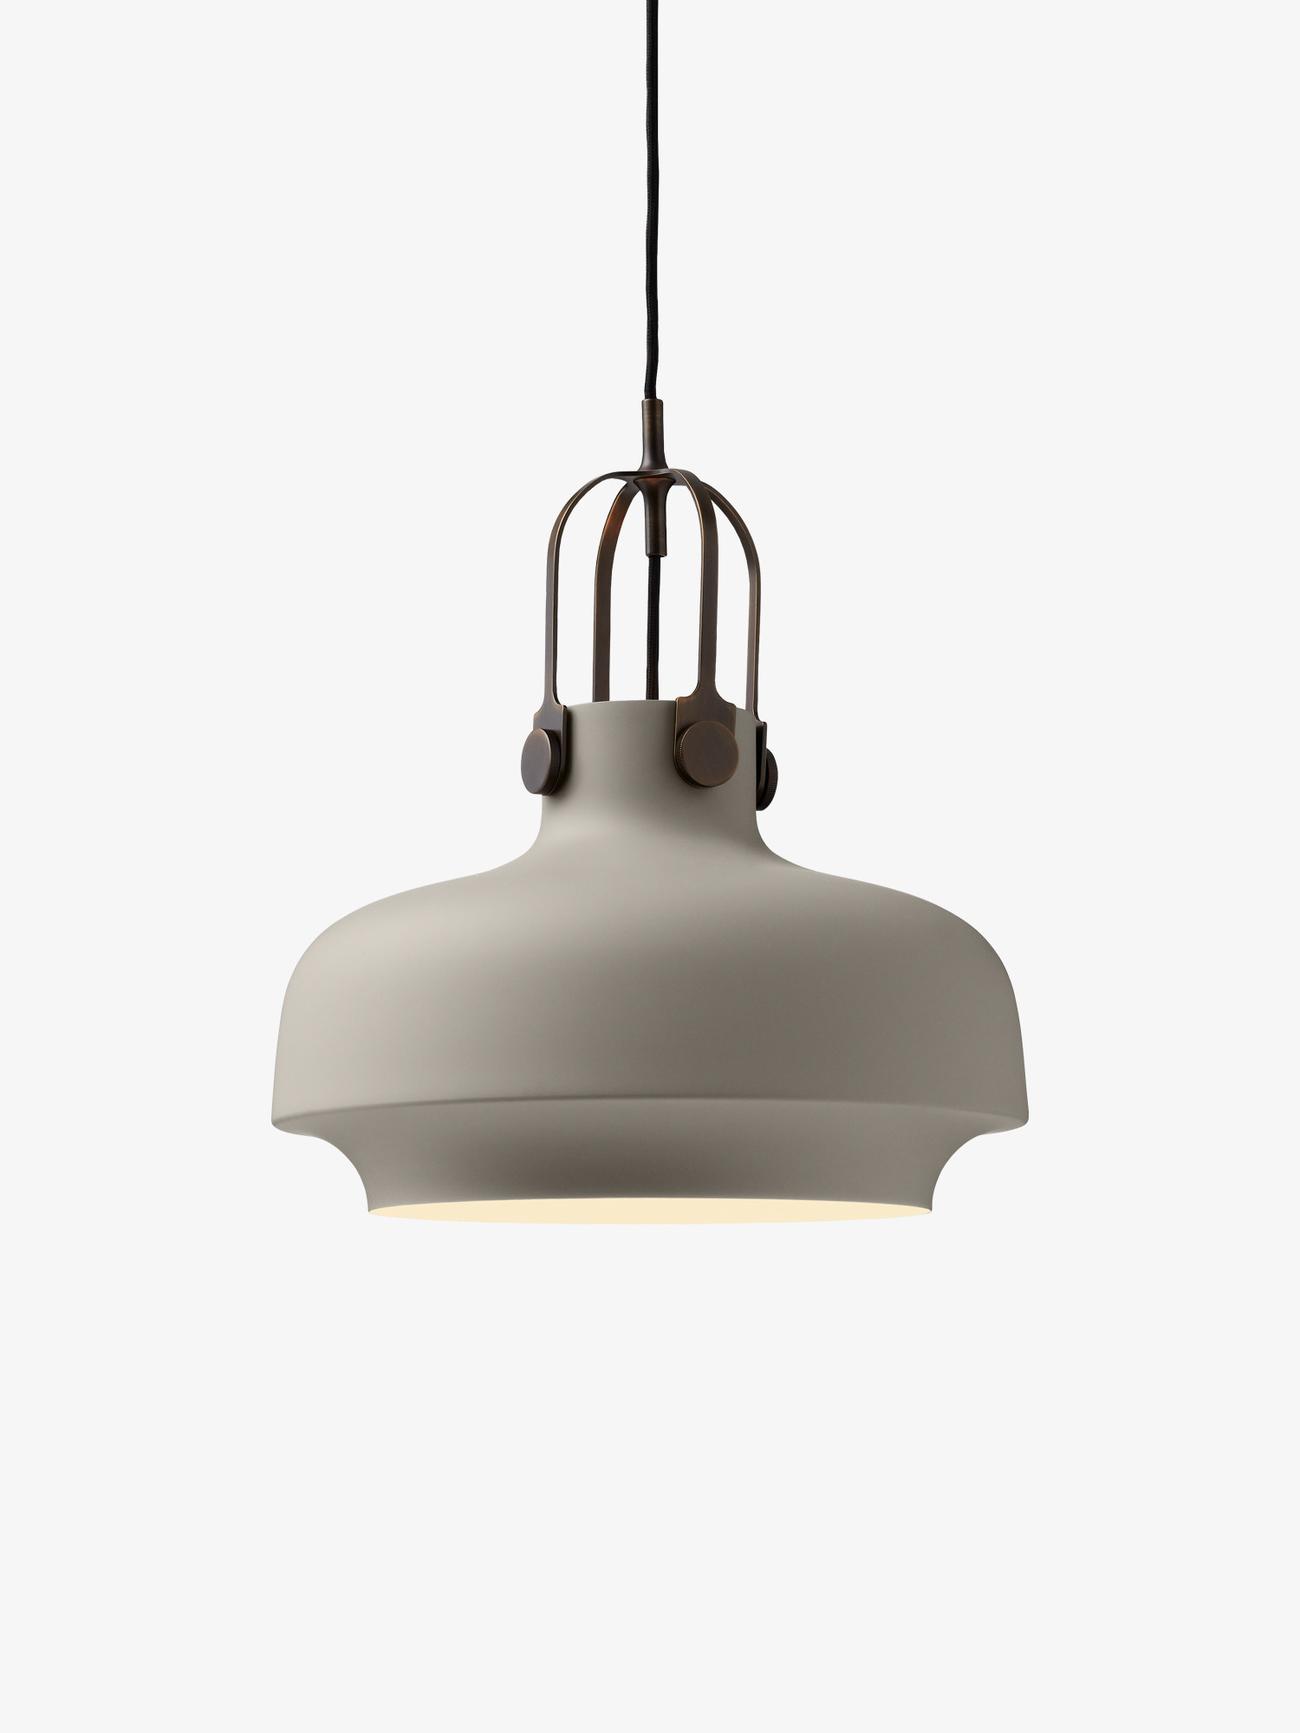 tradition Copenhagen hanglamp SC7 Stone